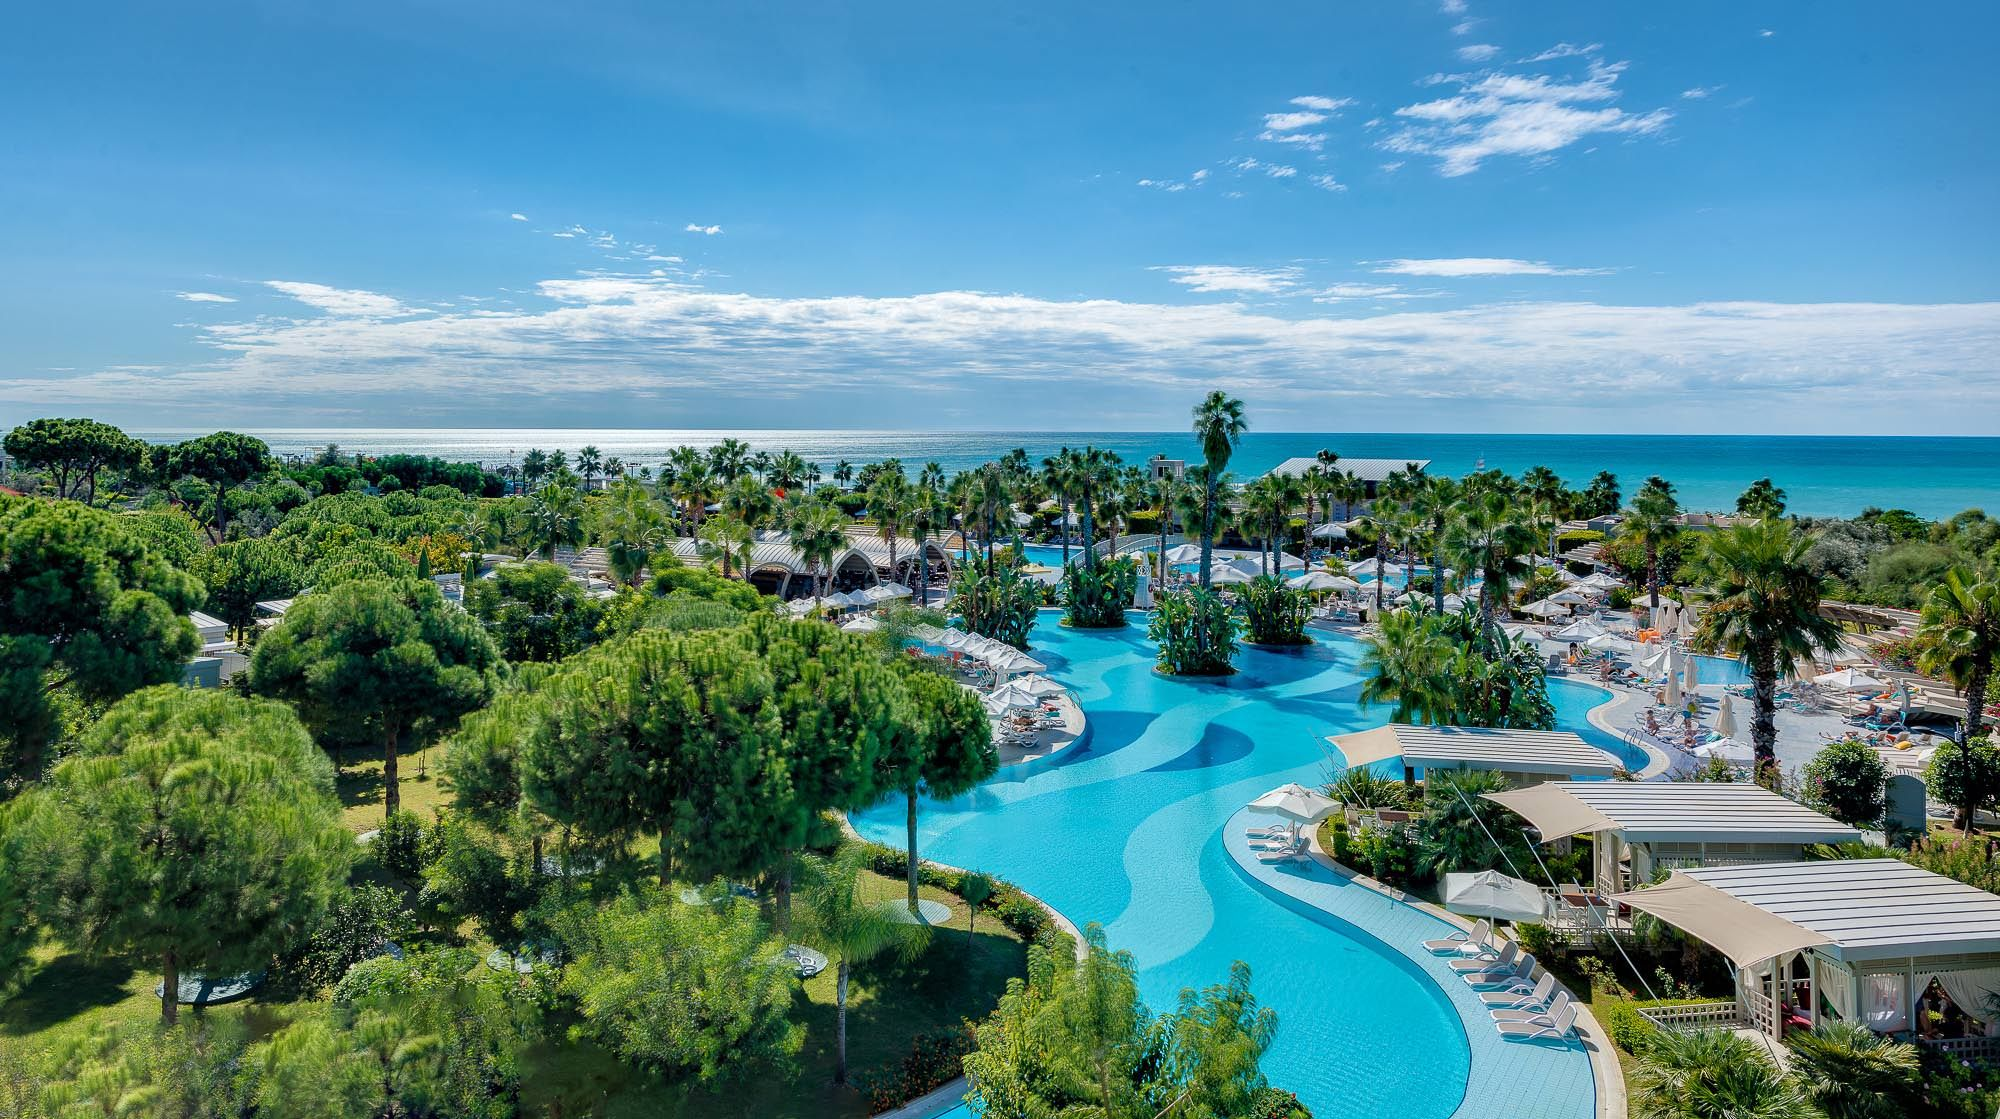 Golf Resort With 5 Stars Luxury Booking